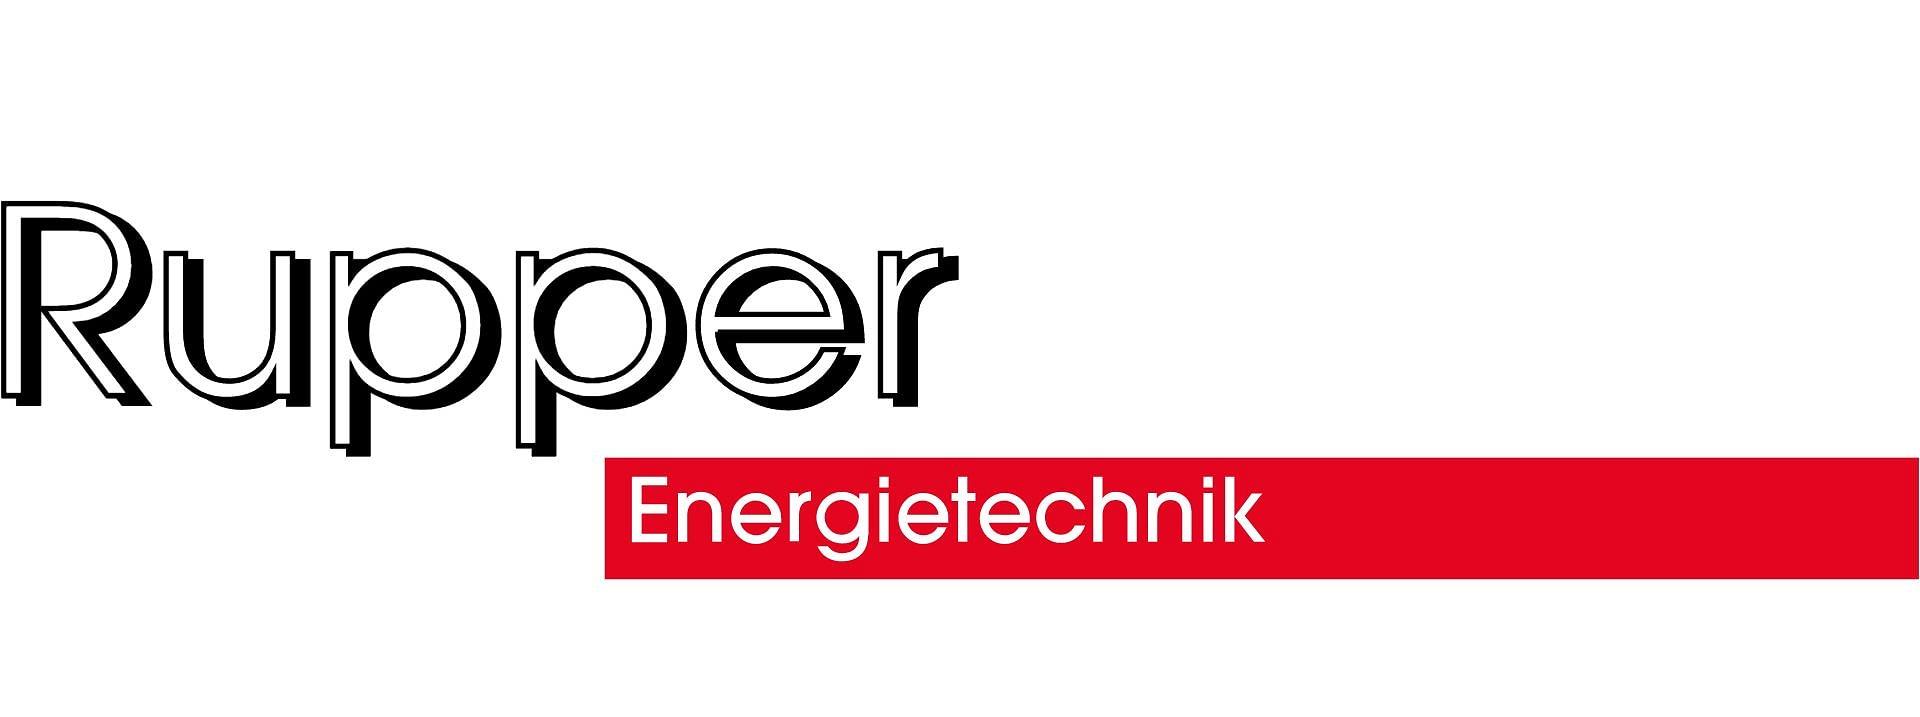 Rupper Energietechnik GmbH